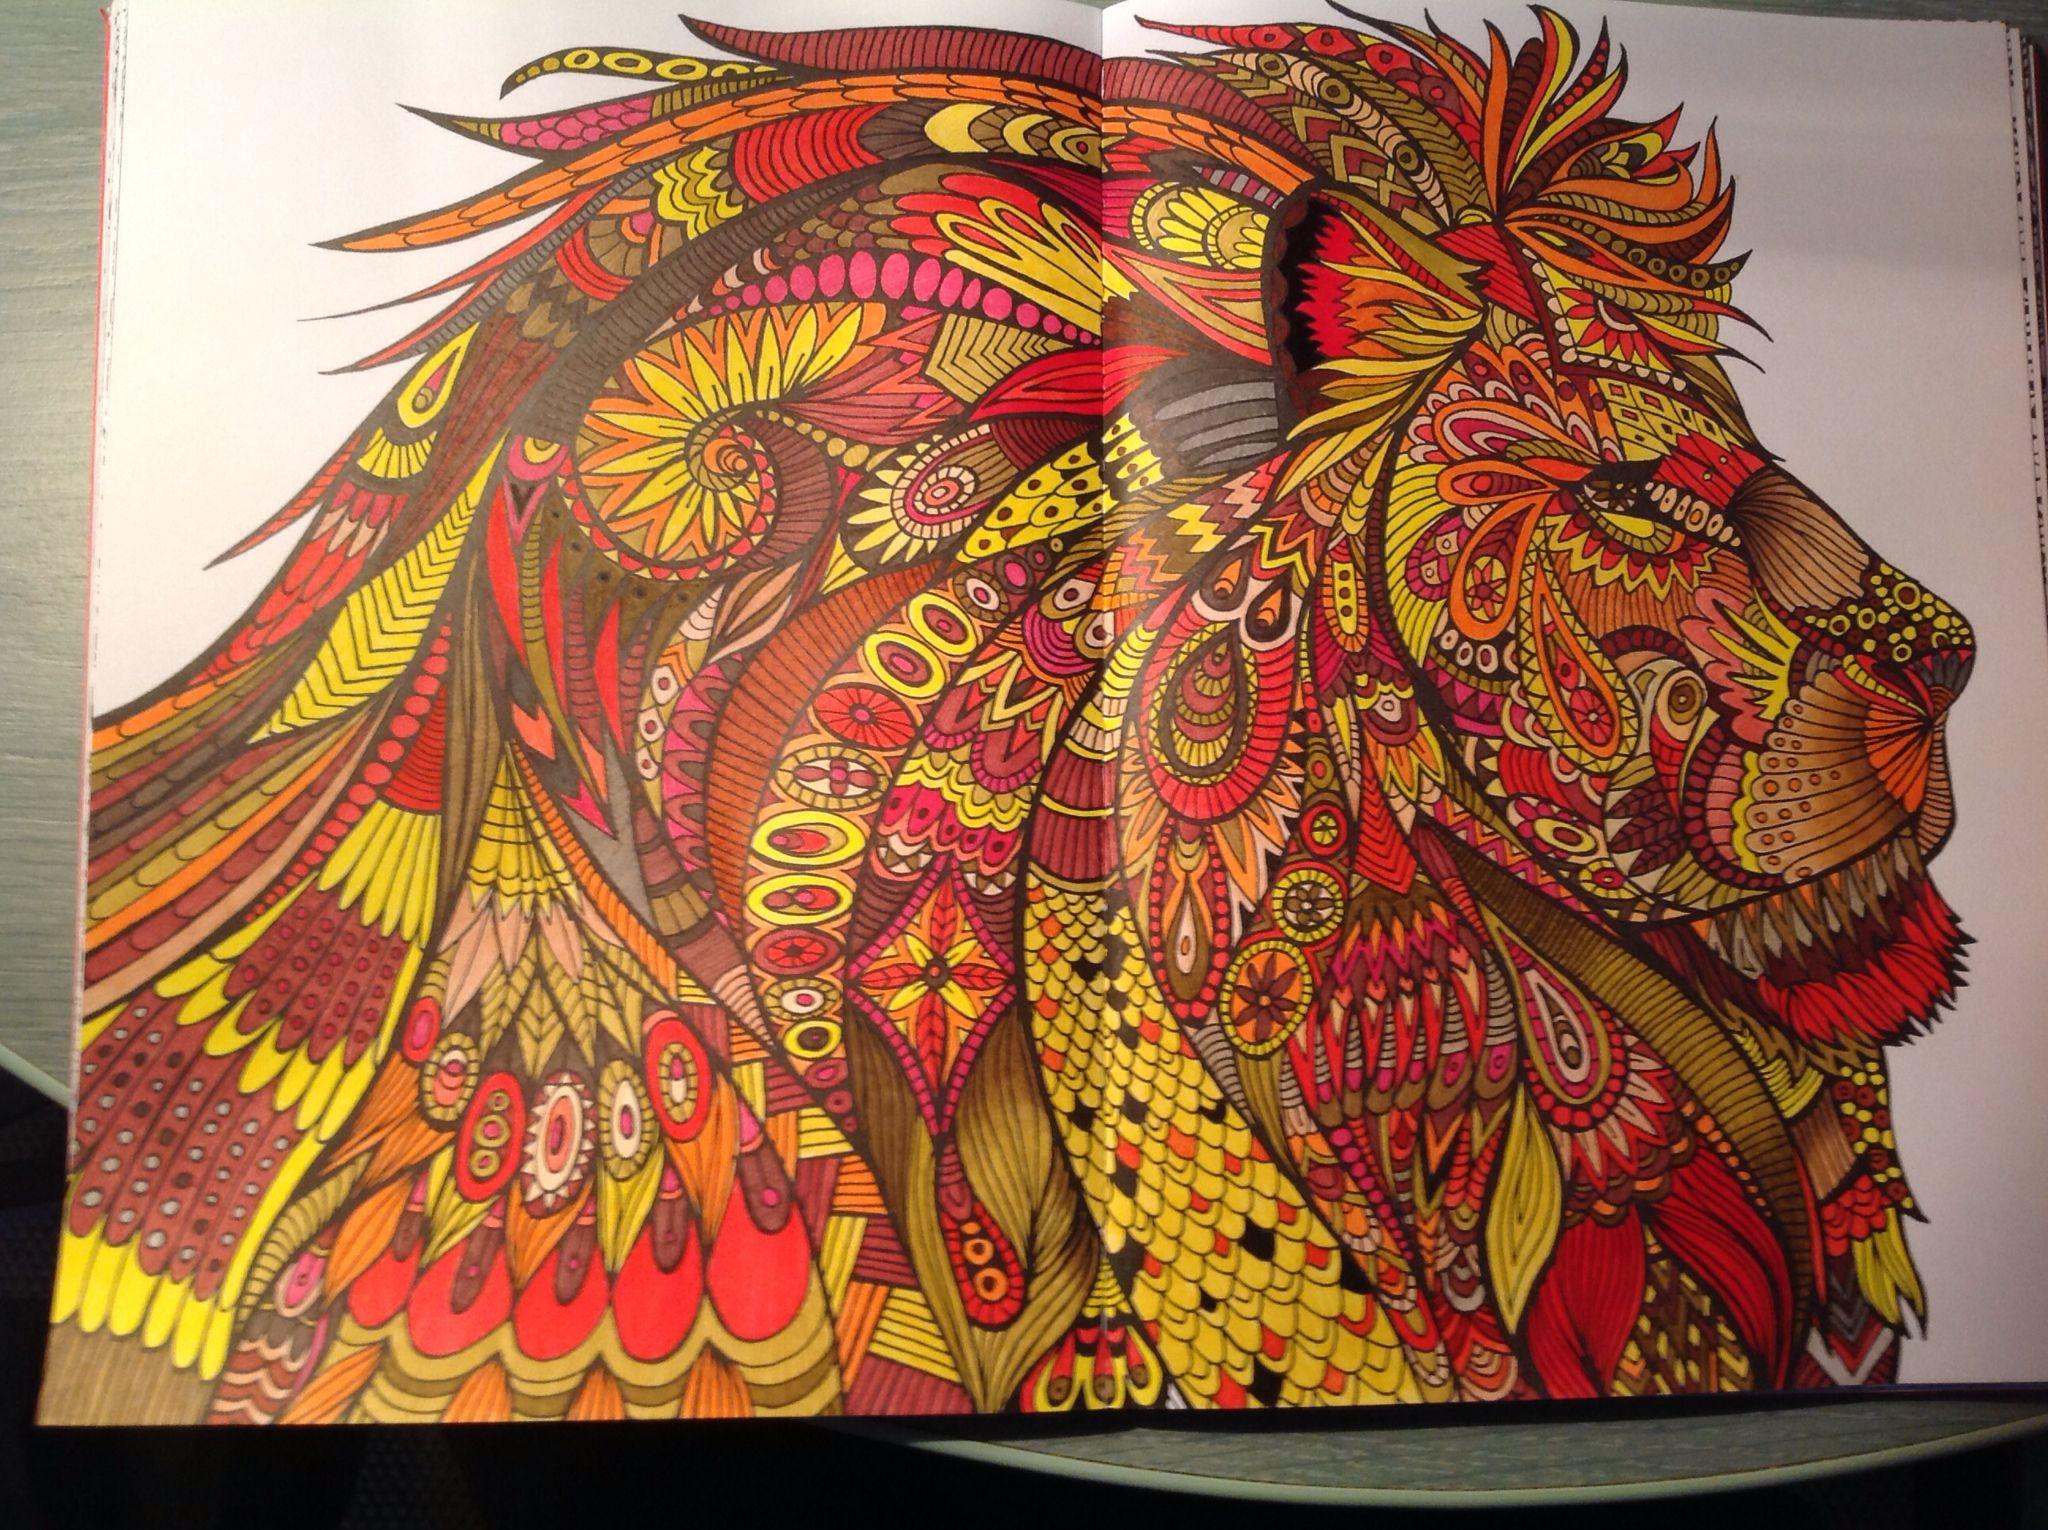 Bestiaire lisa art th rapie pinterest art th rapie therapie et extraordinaire - Coloriage art therapie ...